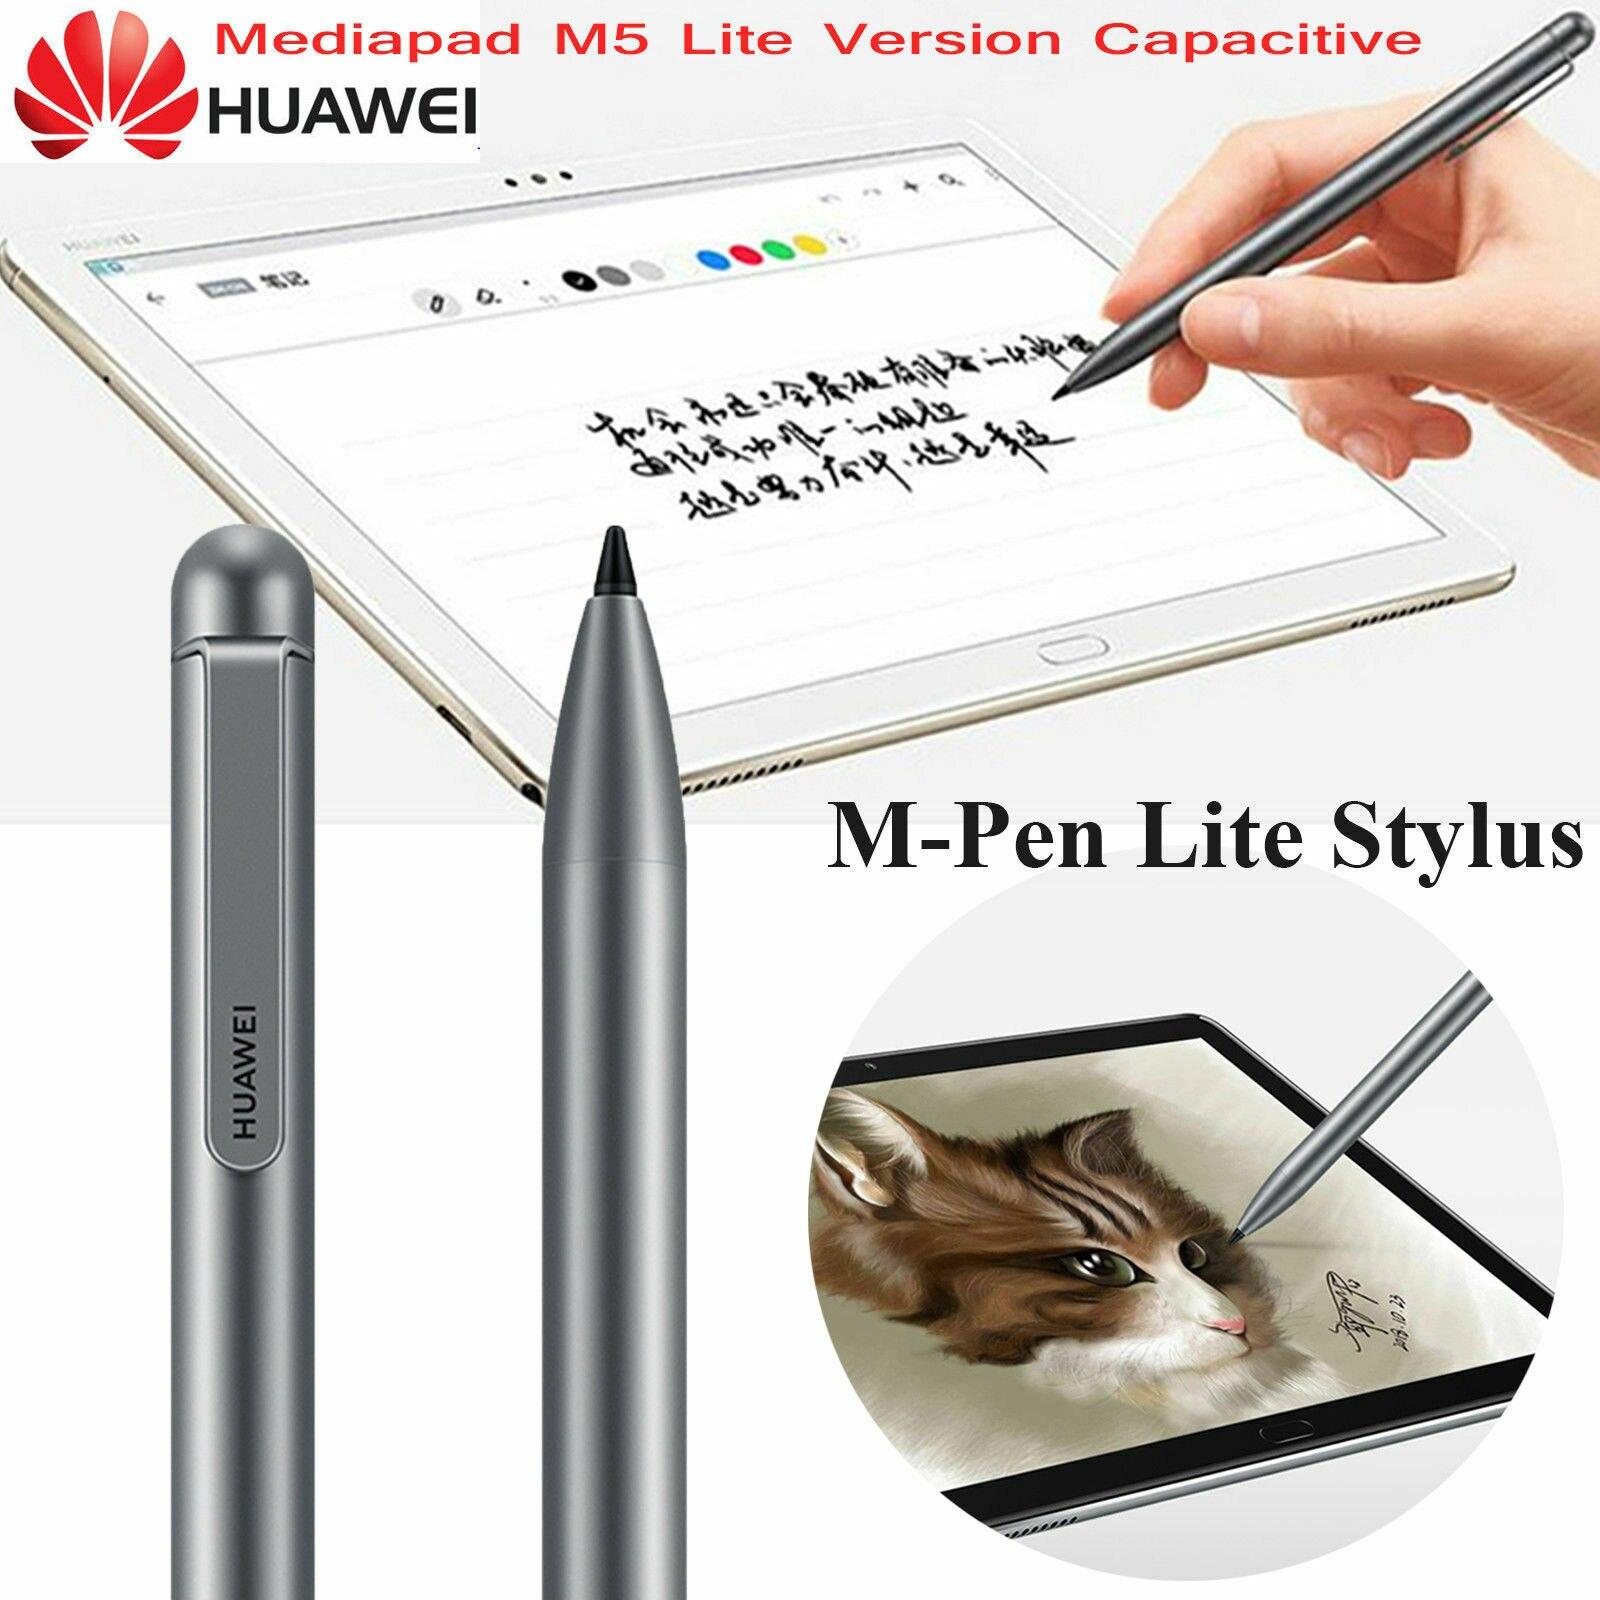 M-PEN lite para huawei mediapad m5 lite caneta capacitiva stylus tablet caneta para matebook e 2019 mediapad m6